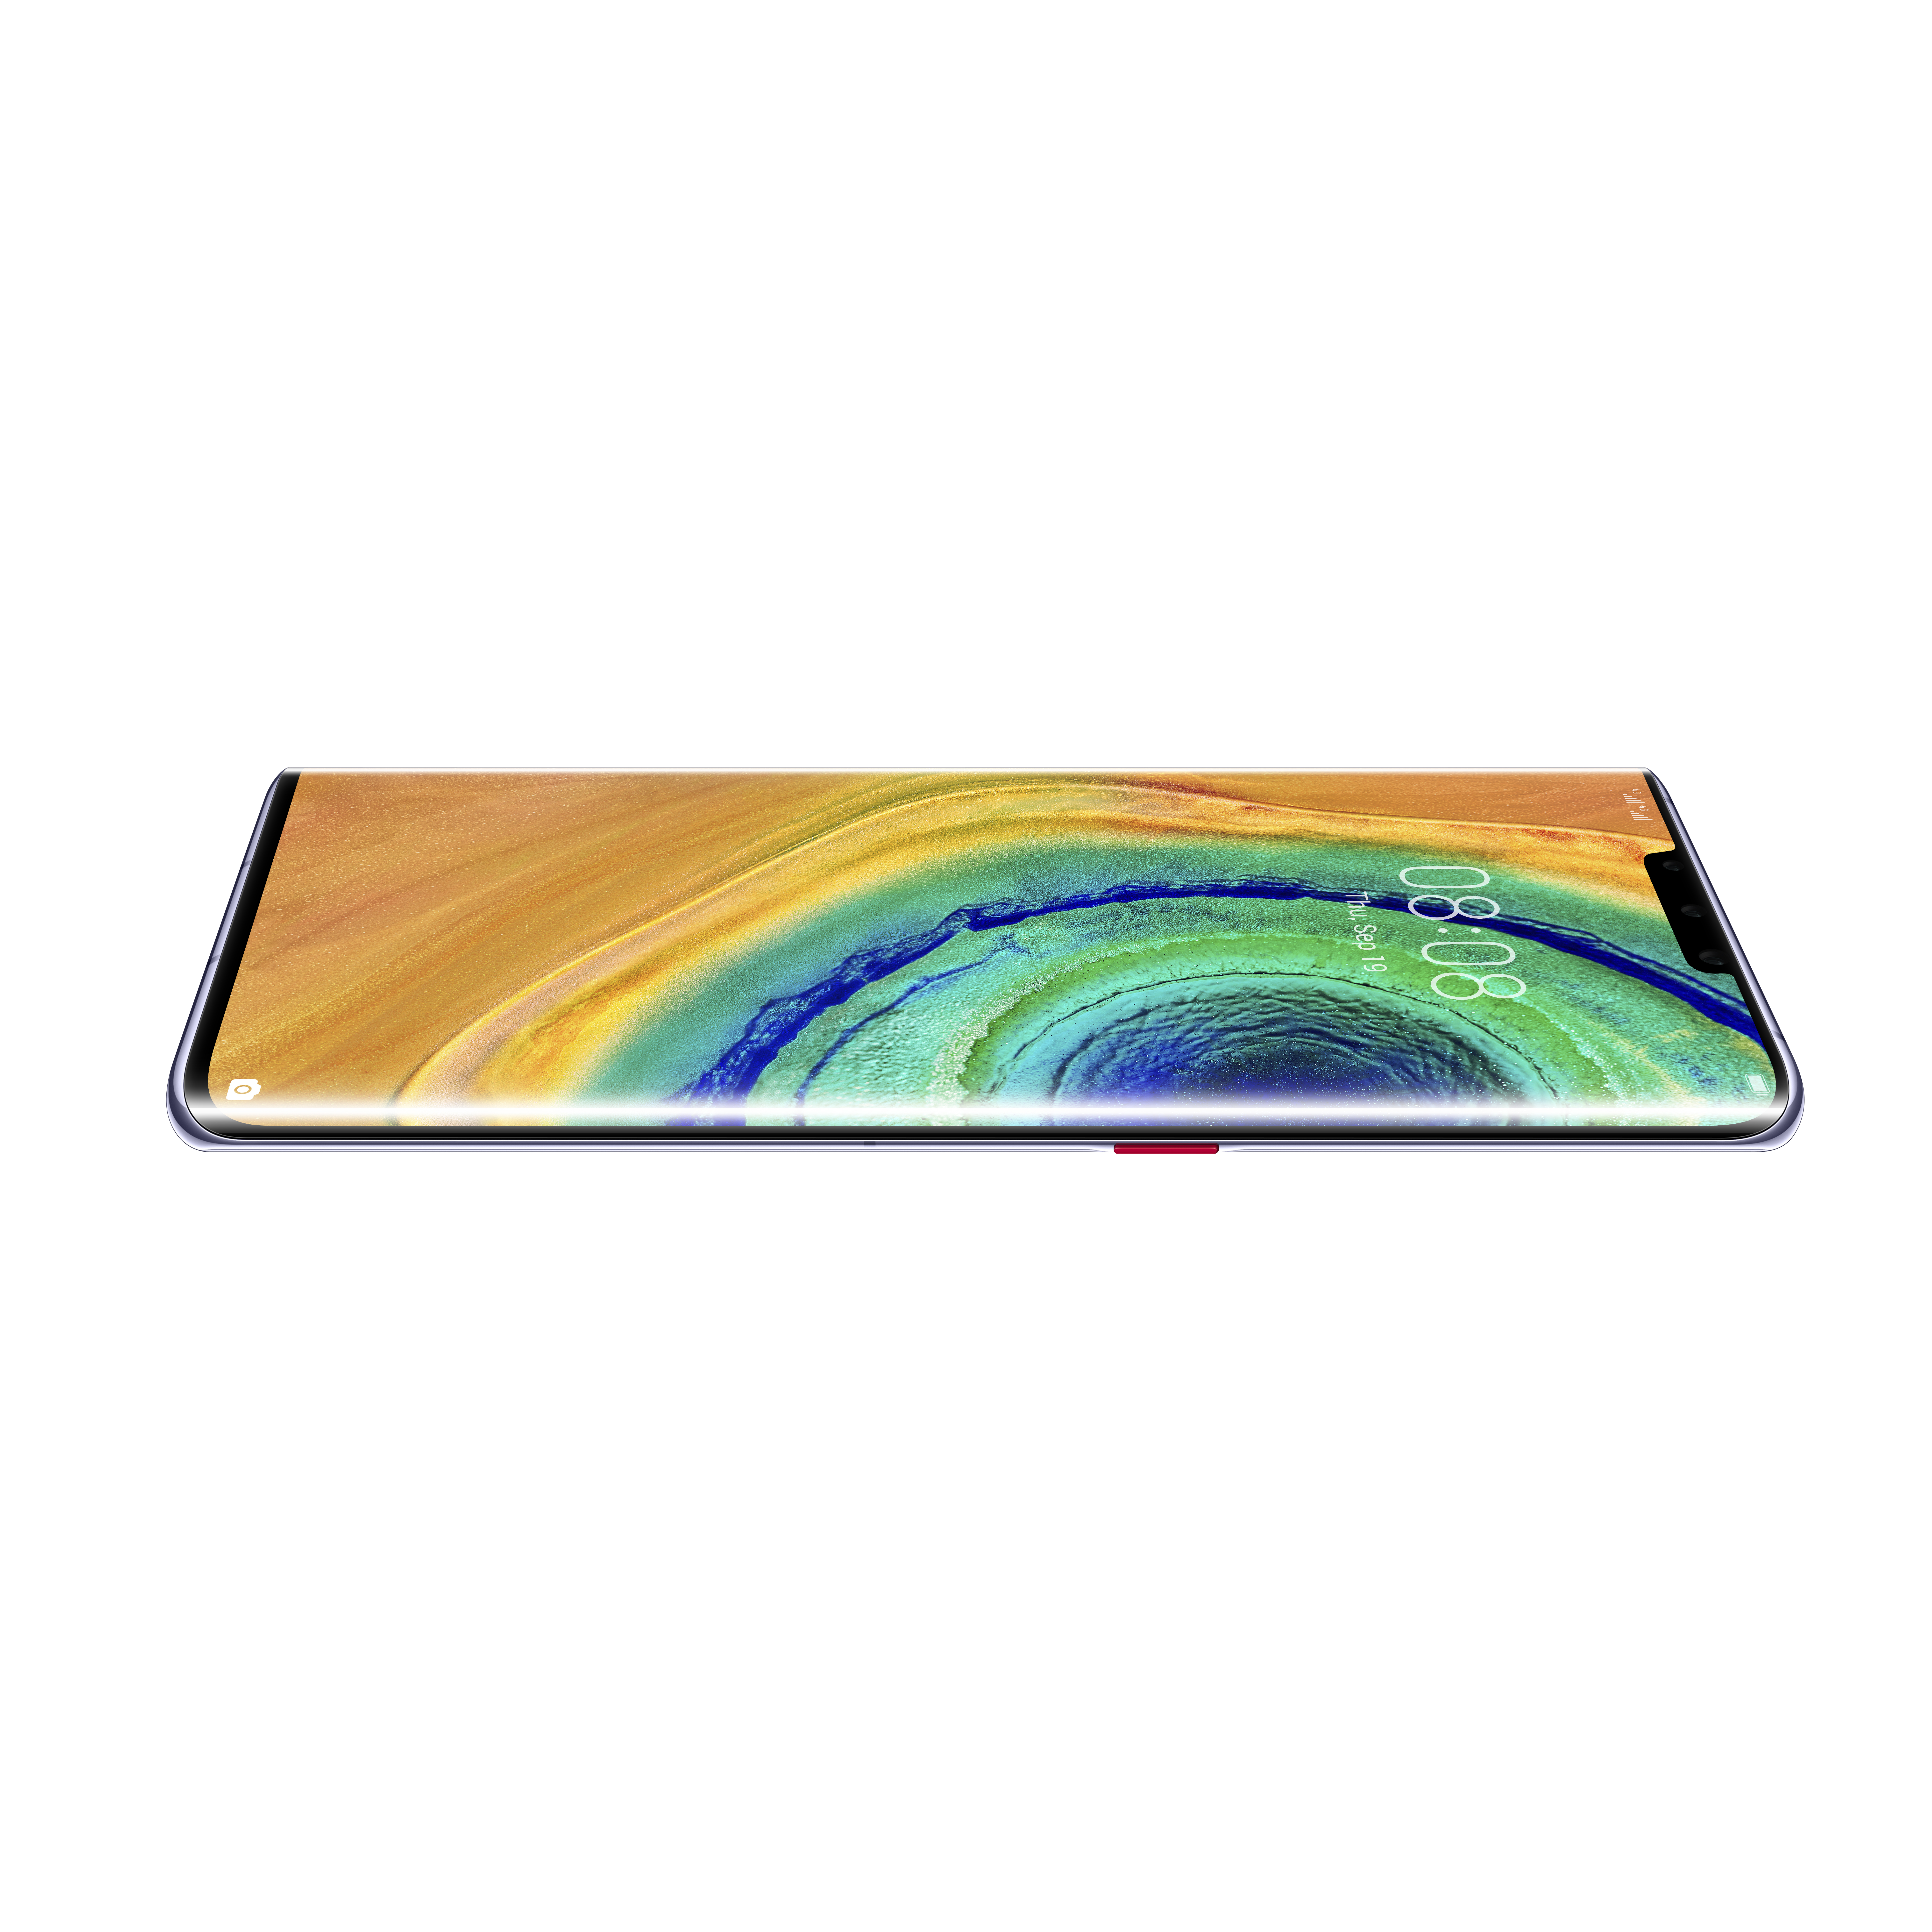 Specs Huawei Mate 30 Pro 16 6 Cm 6 53 Hybrid Dual Sim Android 10 0 Huawei Mobile Services Hms 4g Usb Type C 8 Gb 256 Gb 4500 Mah Silver Smartphones 51094vsu